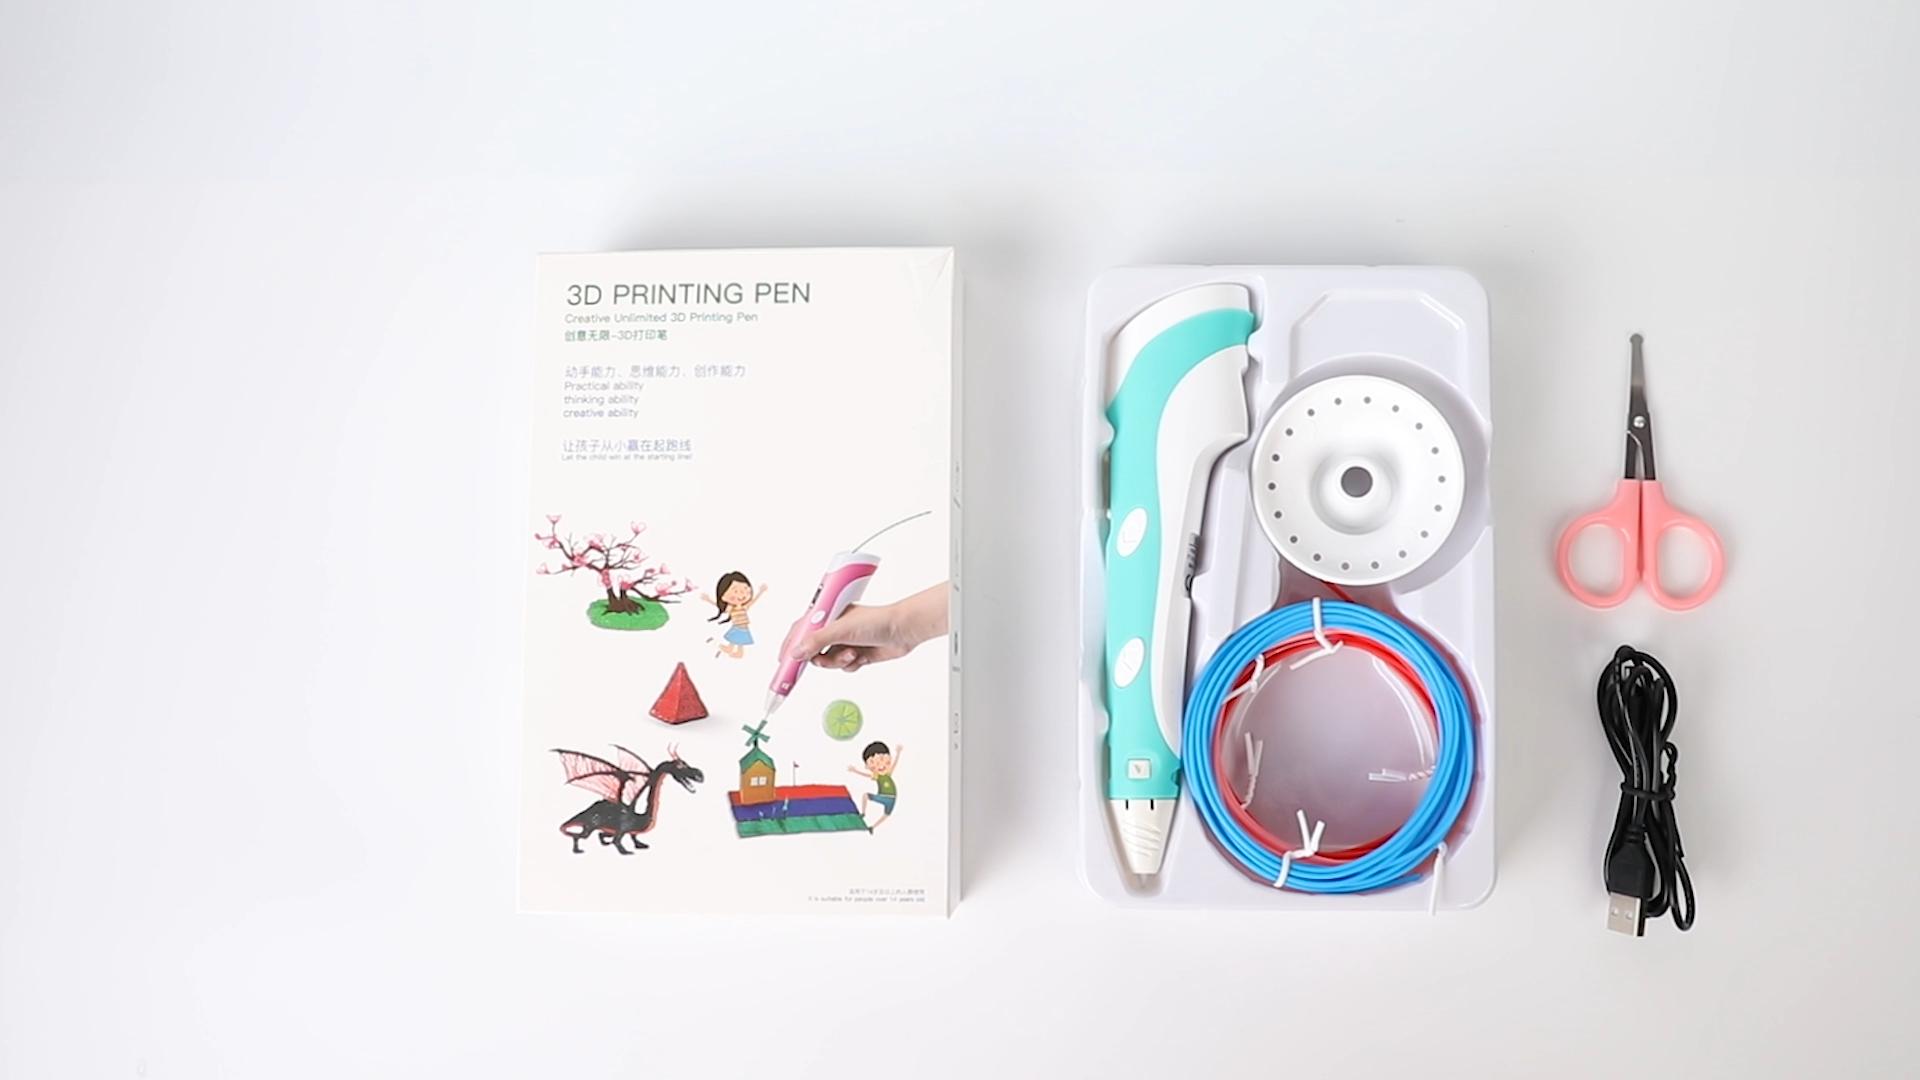 Smallest Kalem for 11 Year Old Children Printing 500Rs Filament Pr800 Digital Leo Evo Doodler 2 Max Amazon 3D Printer Pen